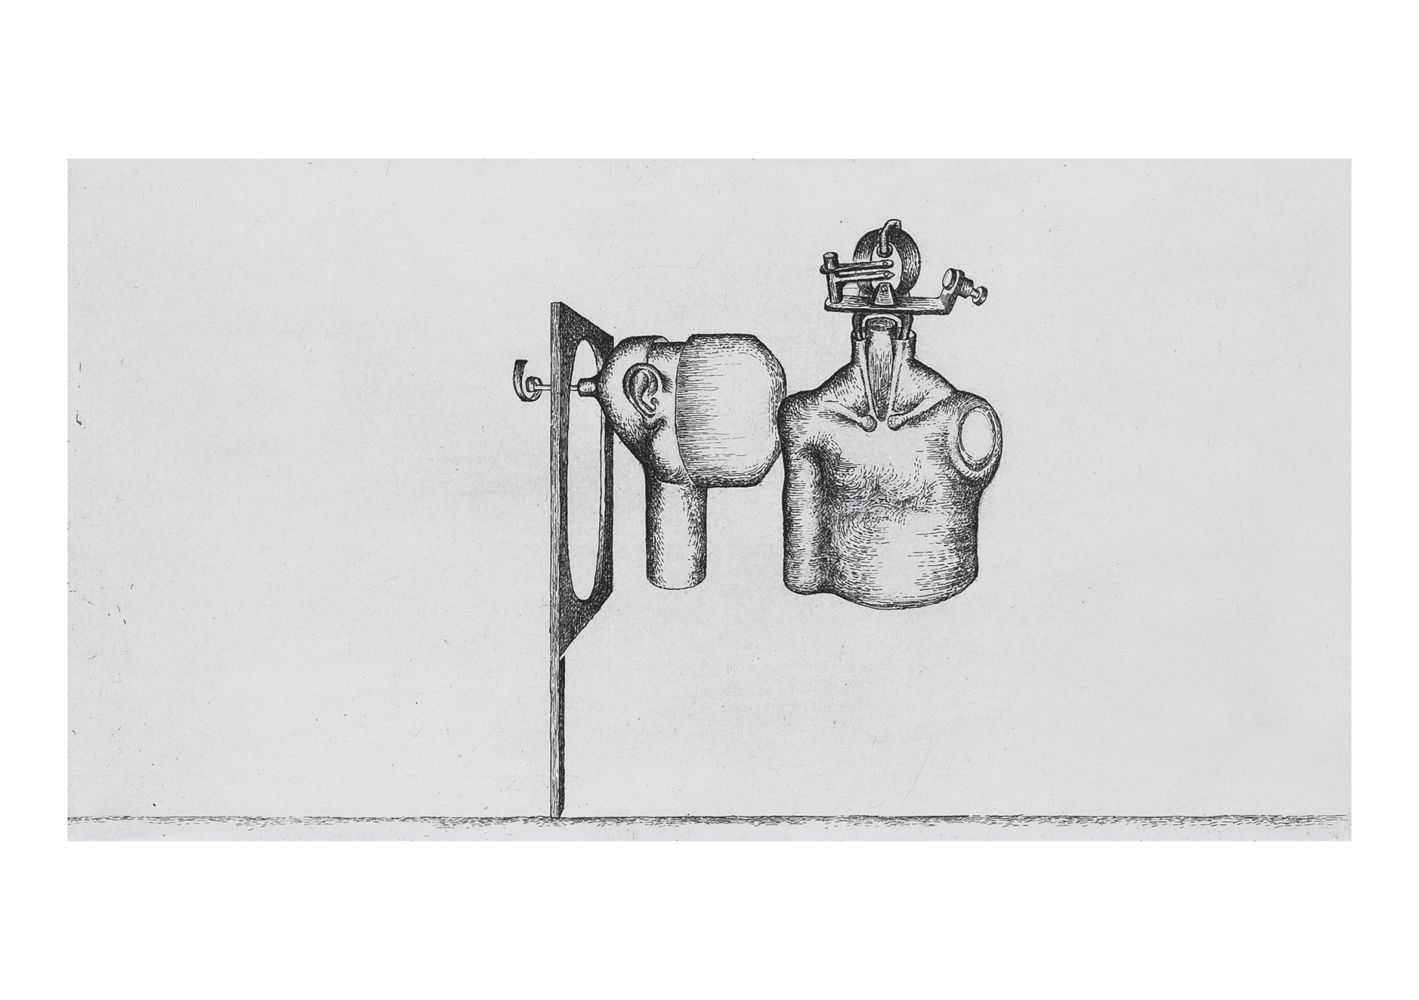 Richelieu-Drouot - gravure de Sonja Hopf